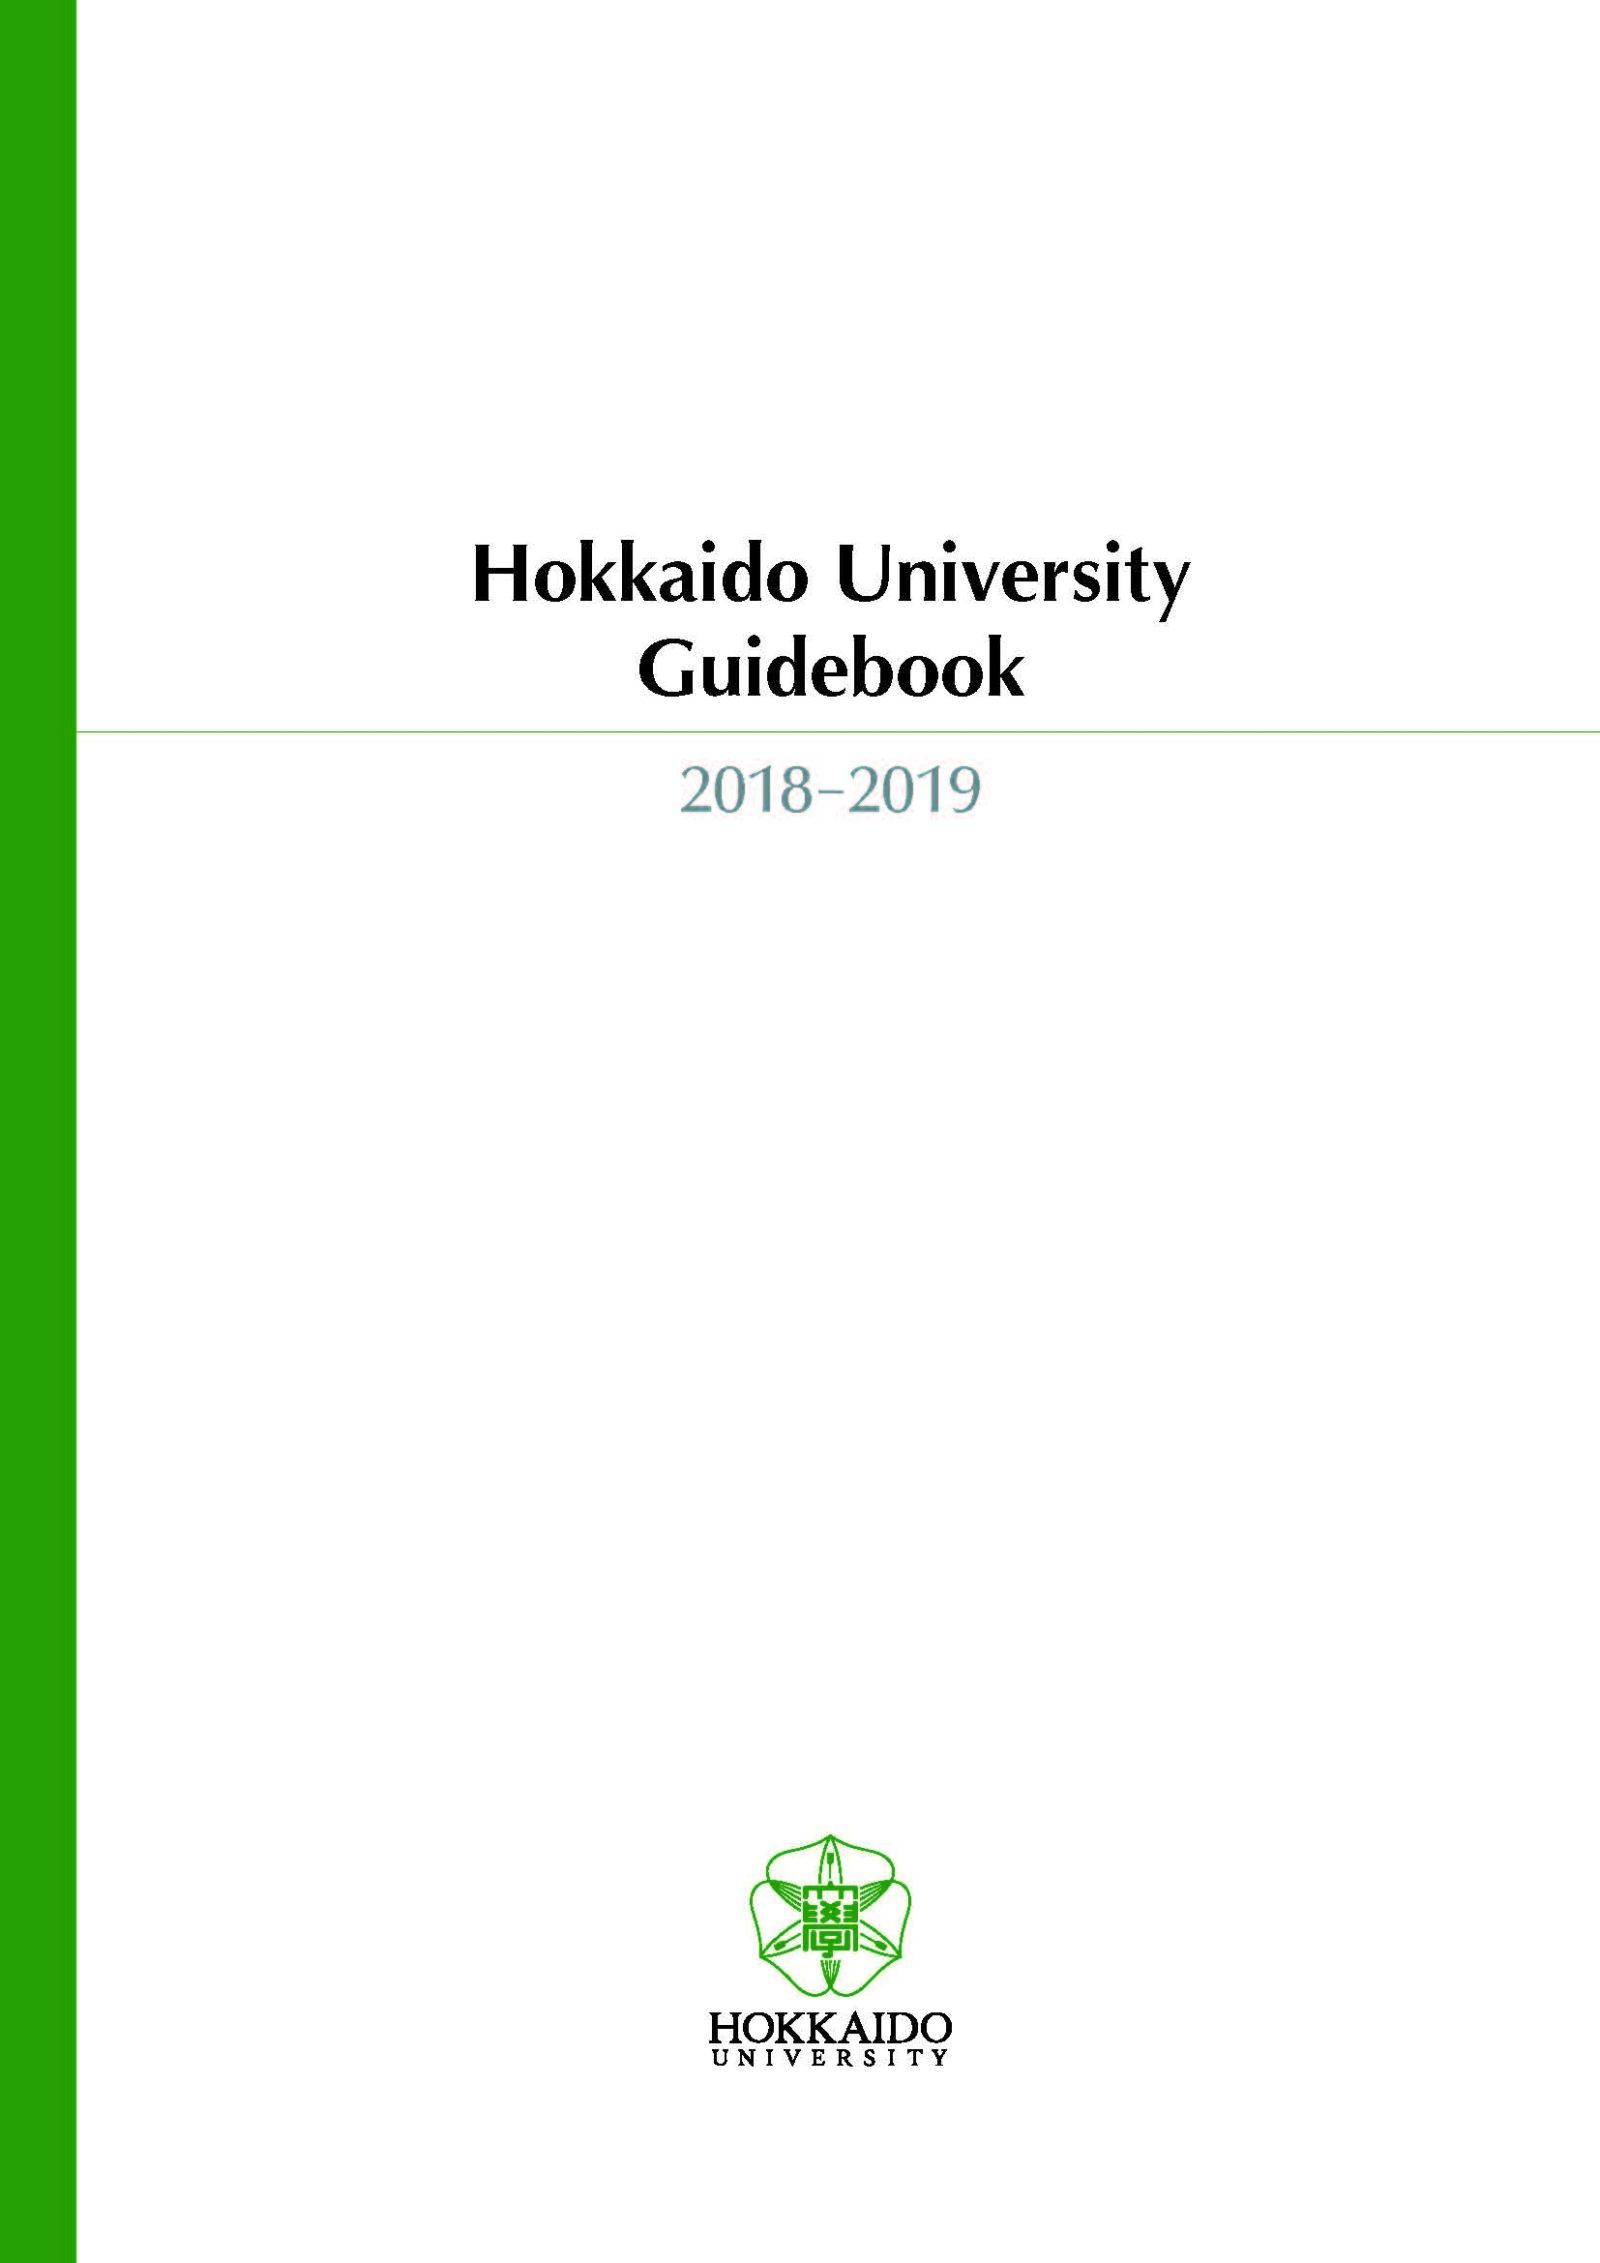 Hokkaido University Guidebokk 2018-2019